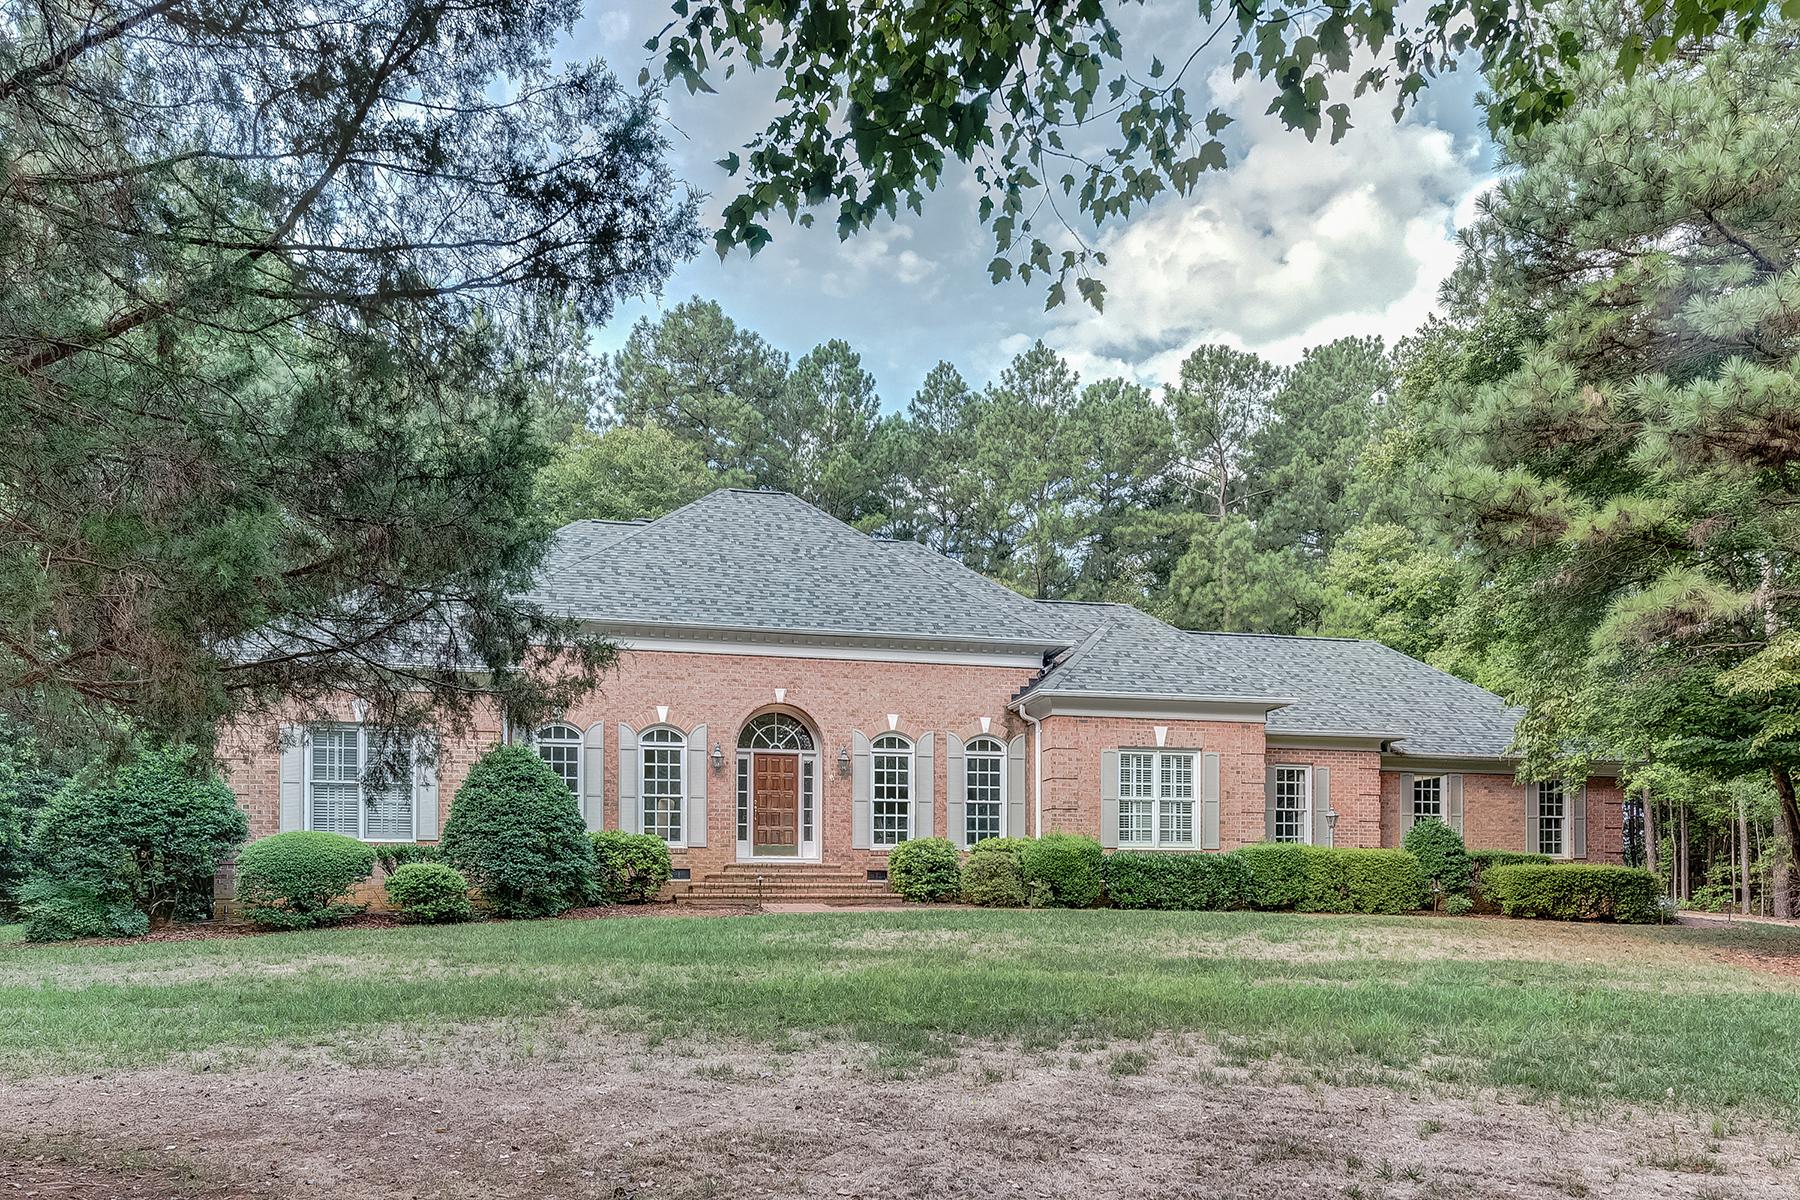 sales property at 3112 King Olaf Drive, 33, Waxhaw, NC 28173